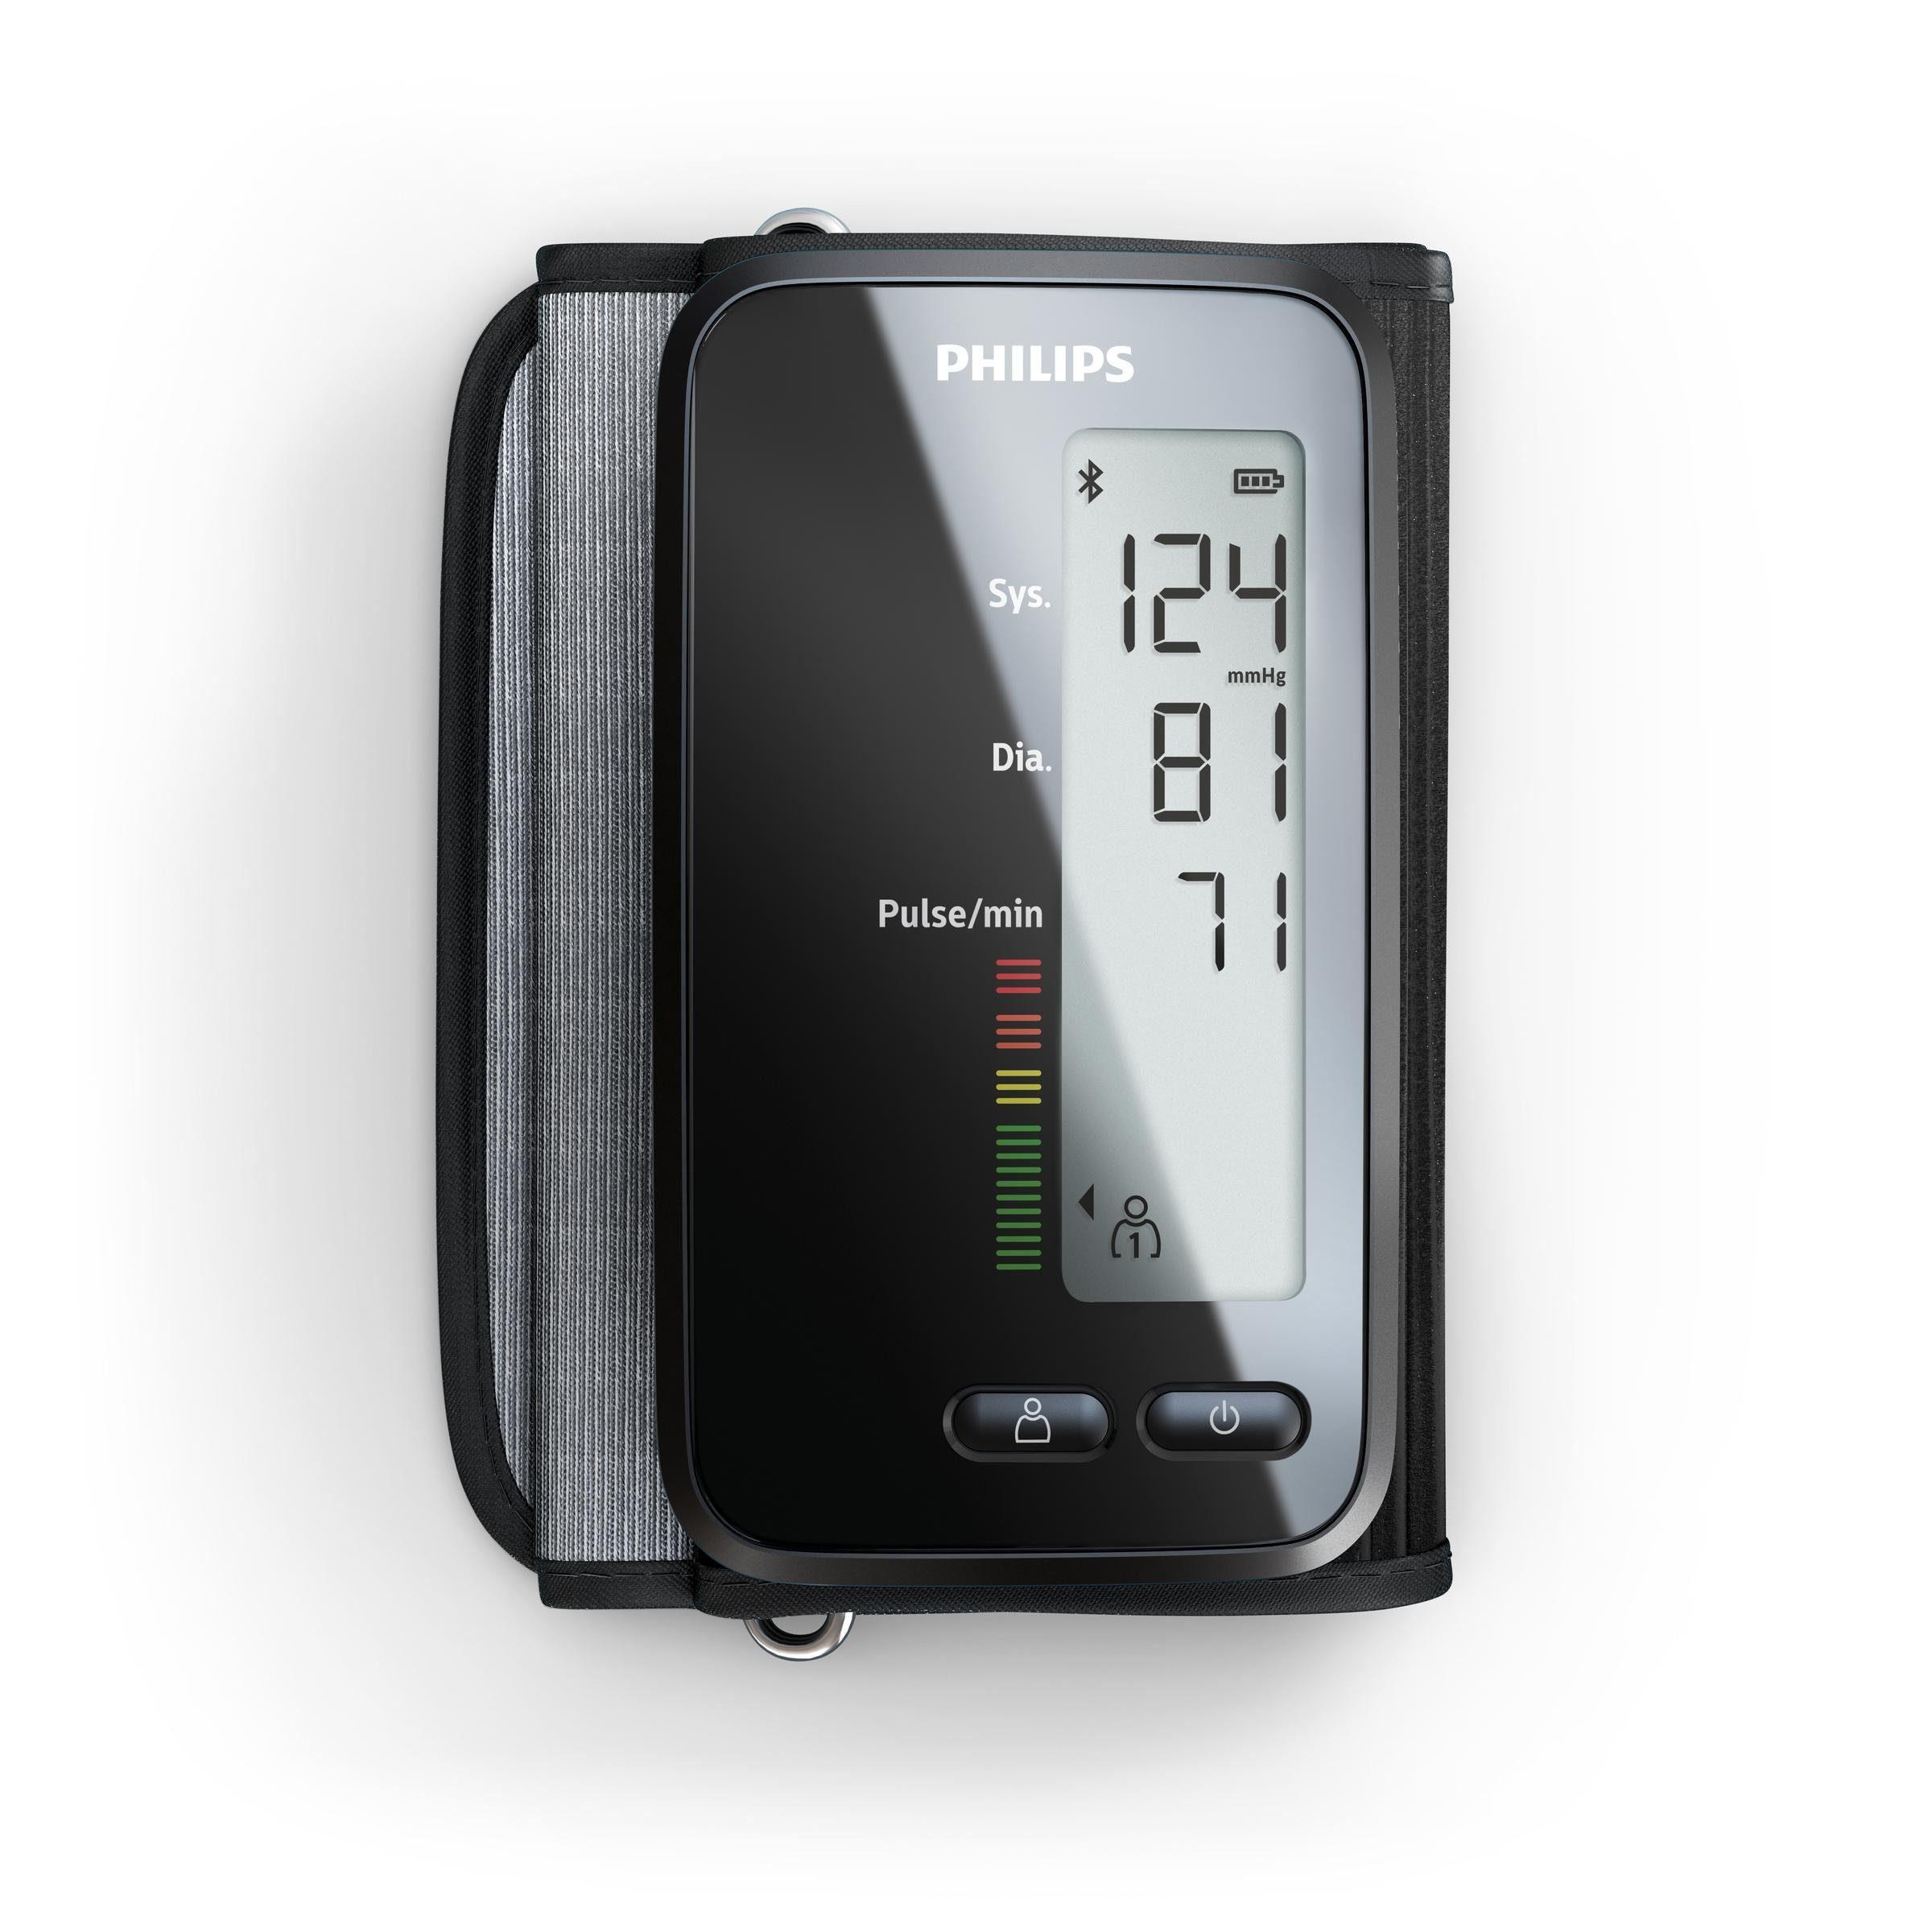 Philips Oberarm Blutdruckmessgerät DL8760/01, mit App-Anbindung